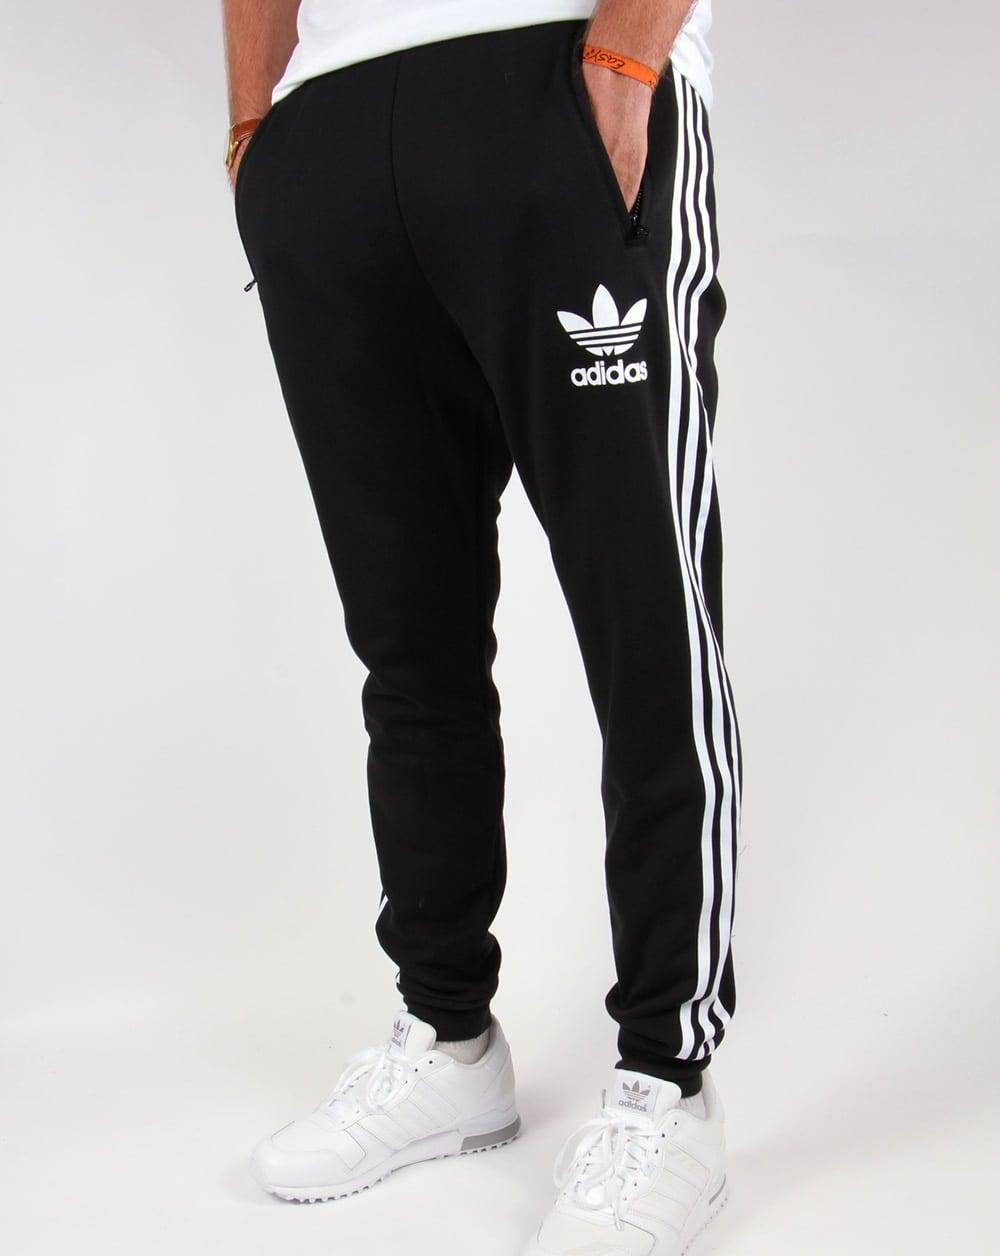 Adidas Originals Adicolor Sweatpants